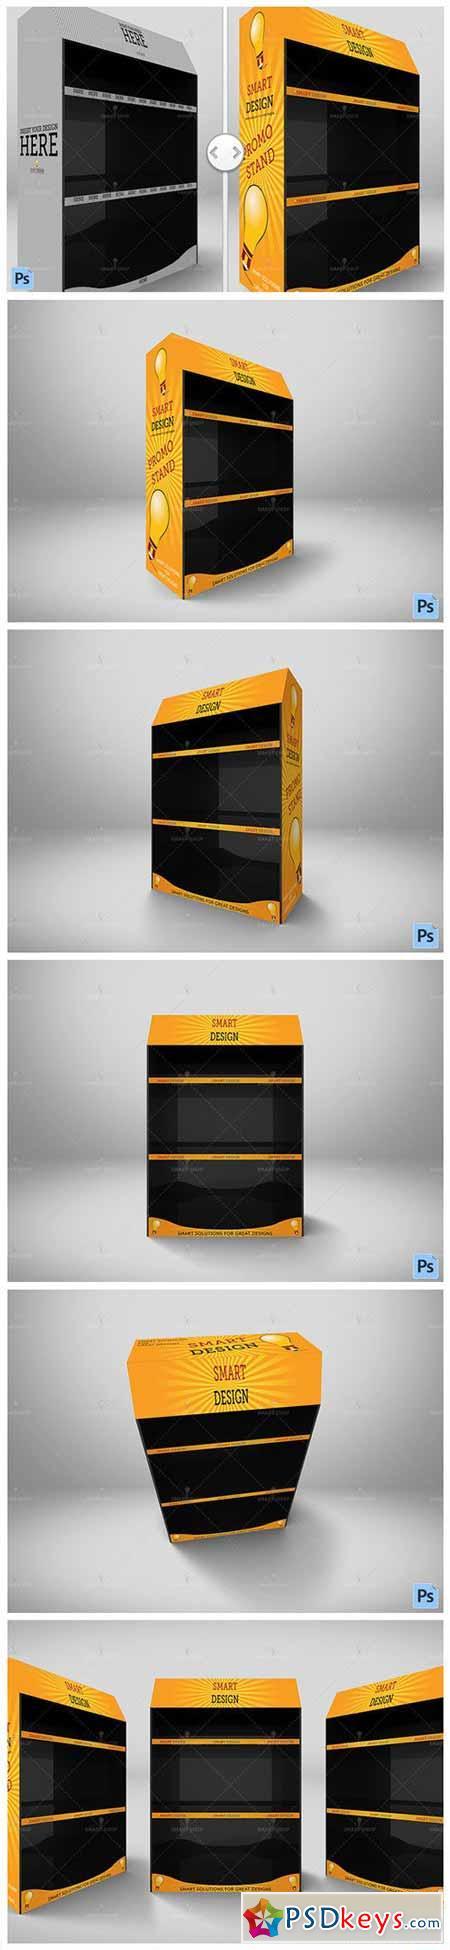 Promotional Shelf Display Mockup 565915